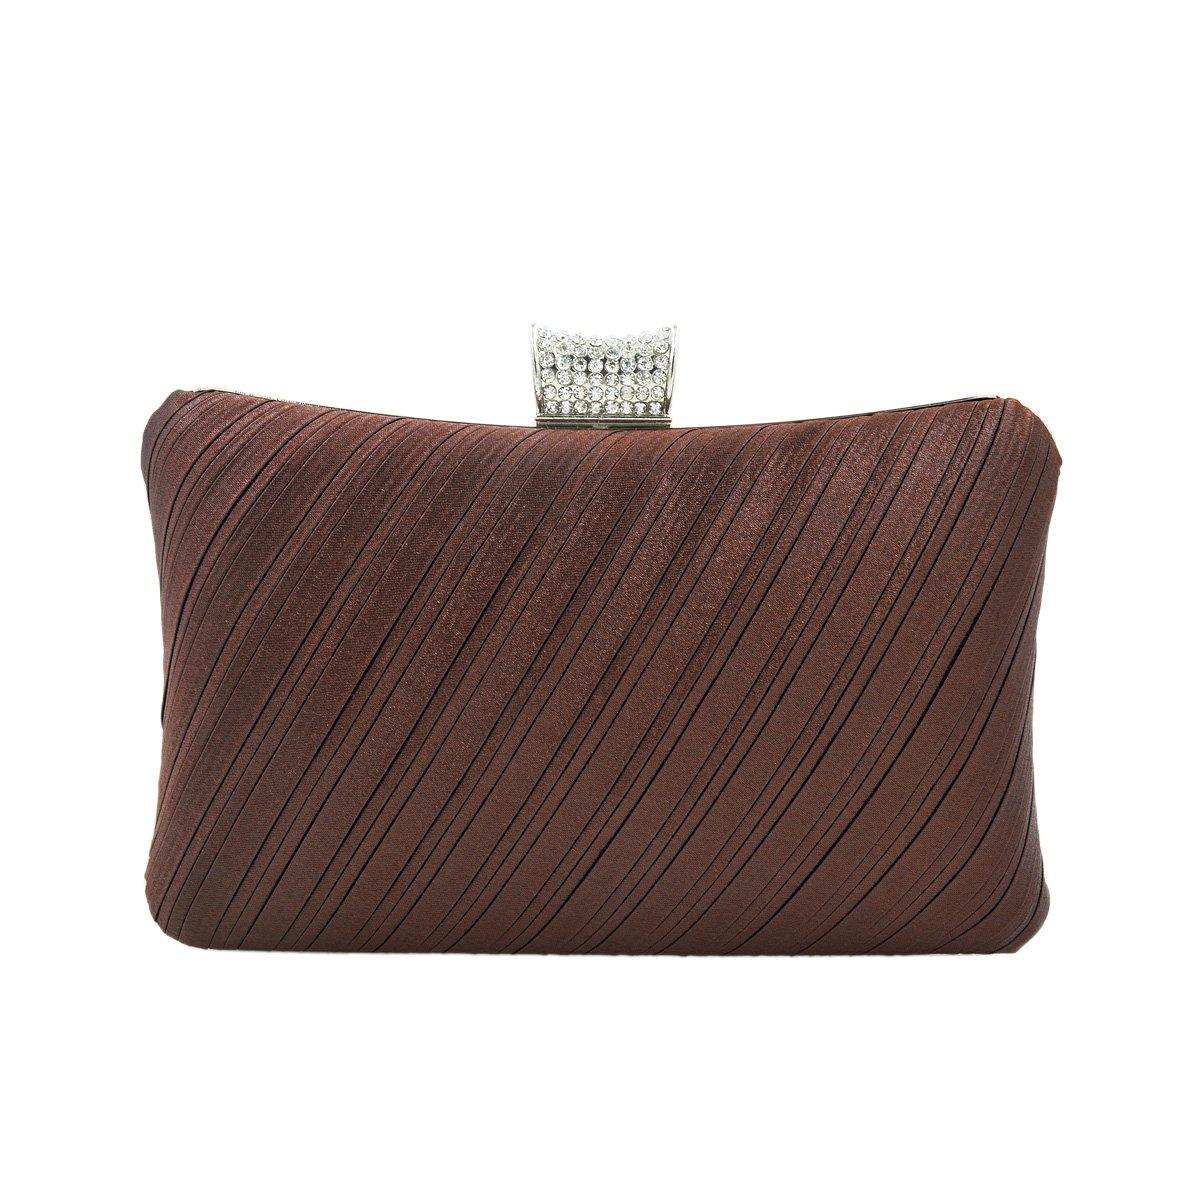 Elegant Pleated Satin Hard Clutch Rhinestones Top Evening Bag, Coffee